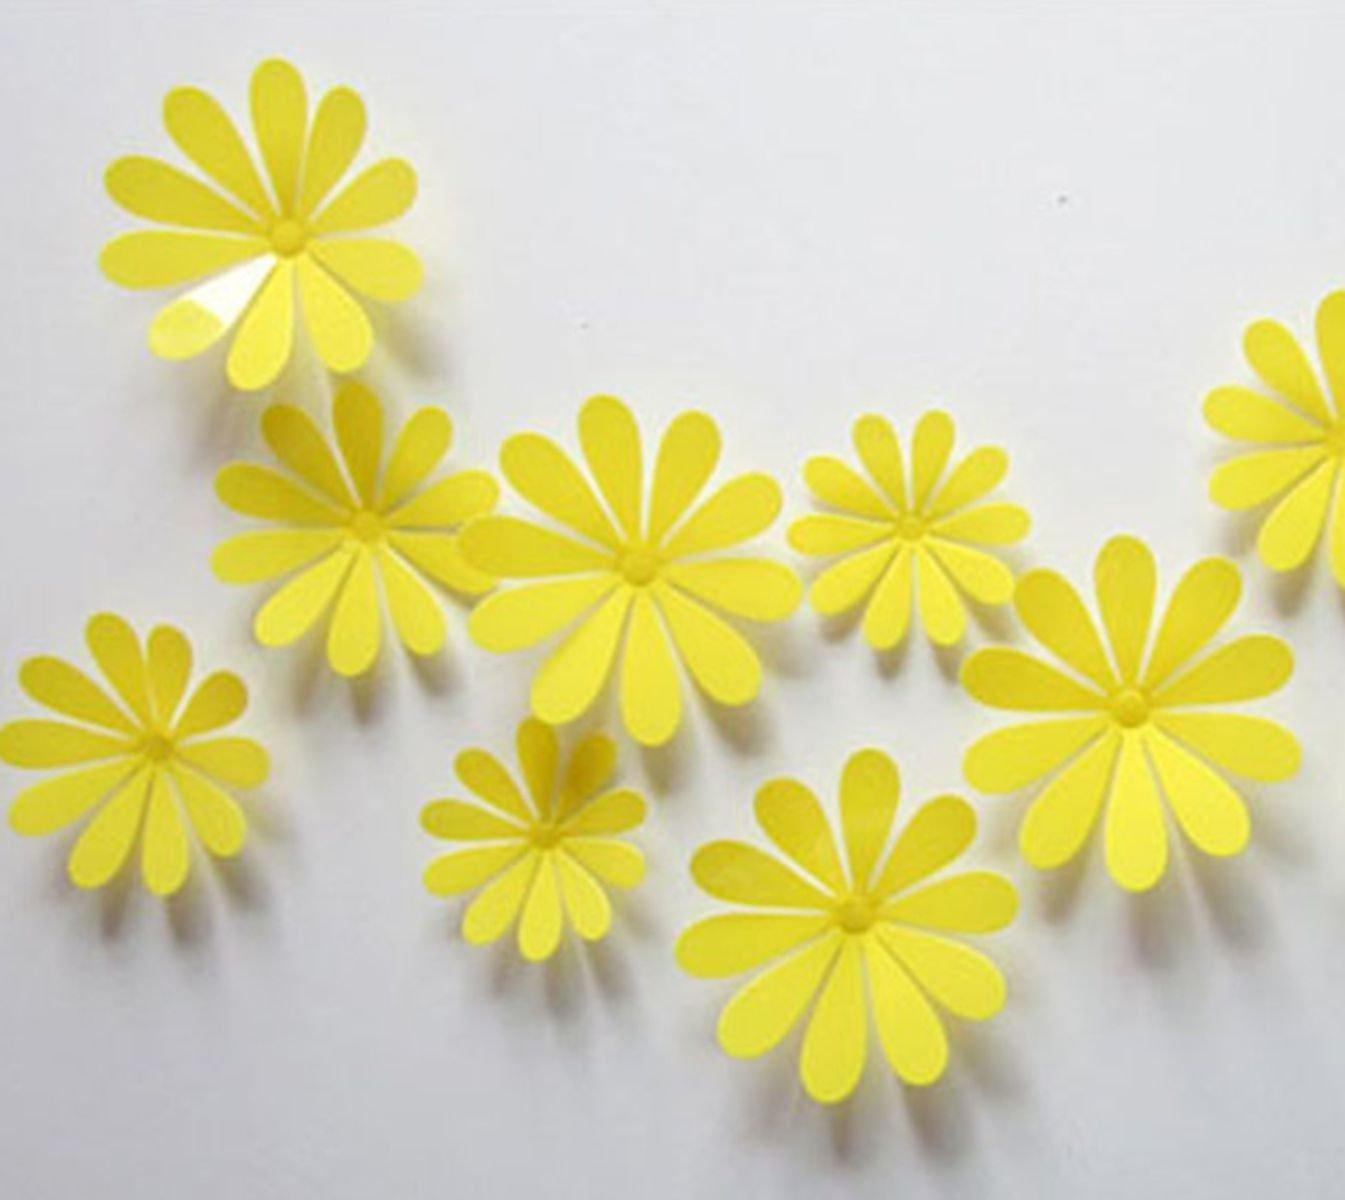 Buy Lenofocus 24pcs 3d Flower Wall Stickers Decor Art Decorations 3 ...